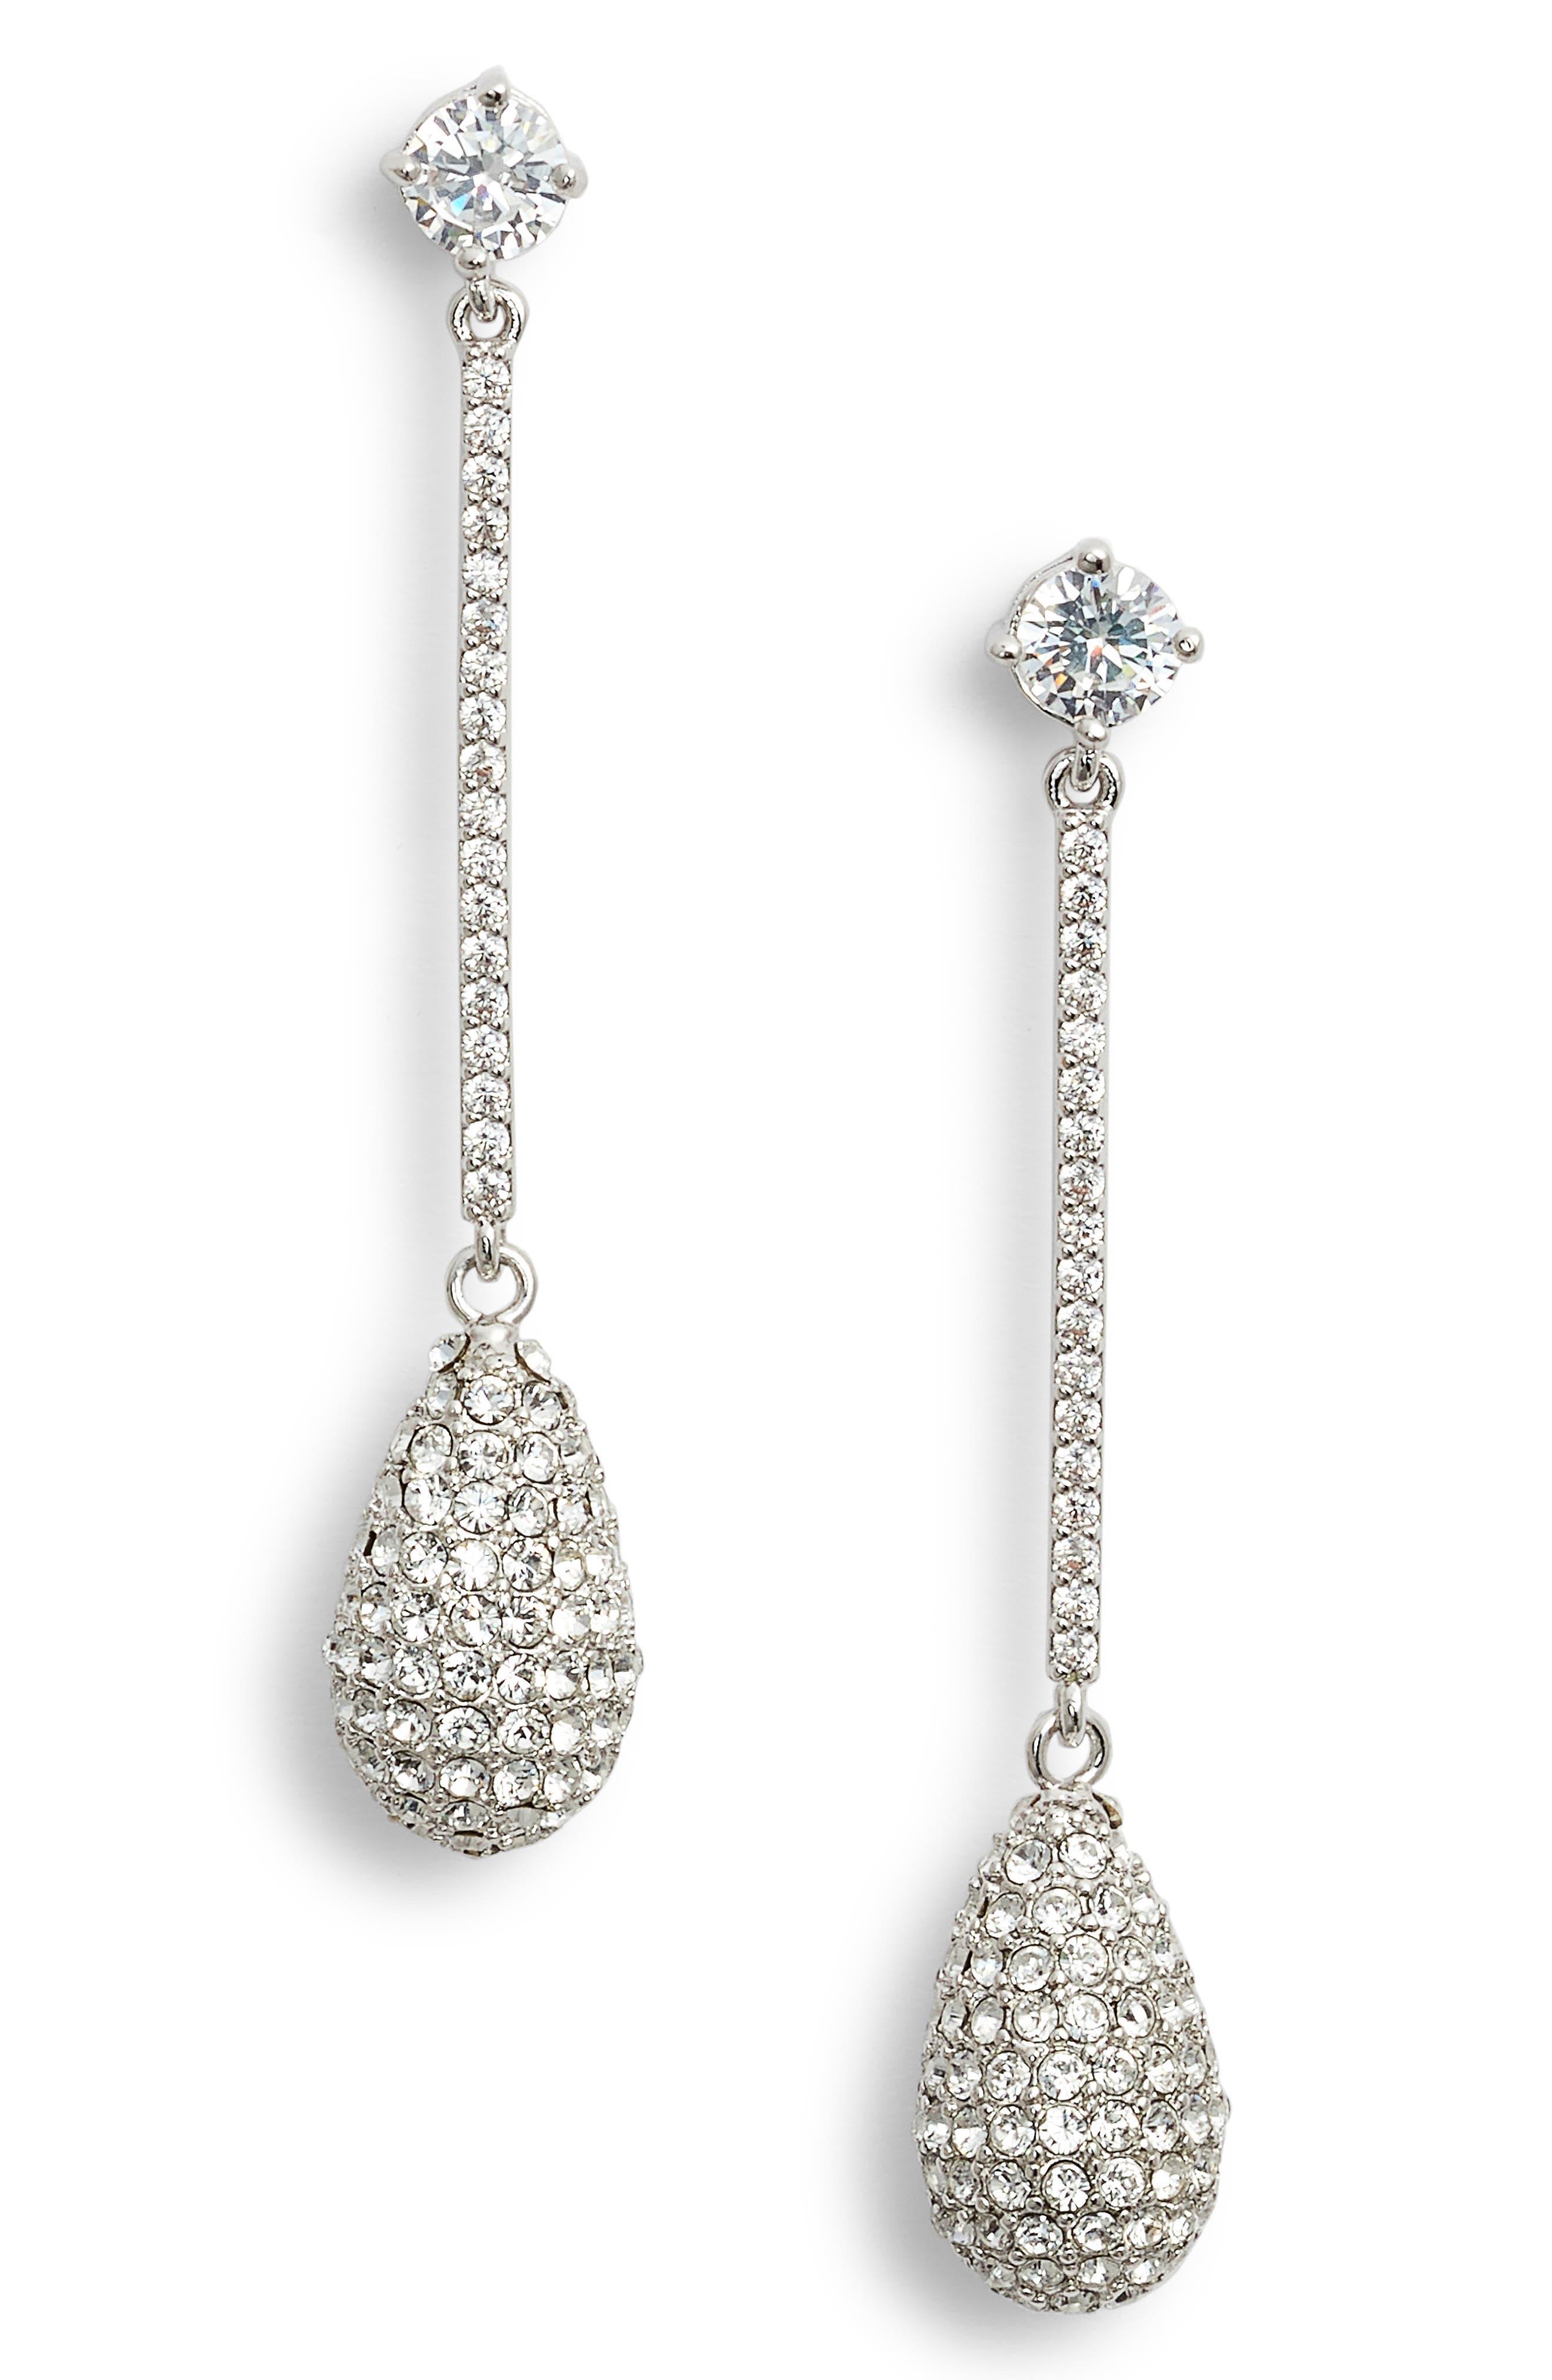 Swarovski Crystal Teardrop Earrings,                         Main,                         color, WHITE/ SILVER